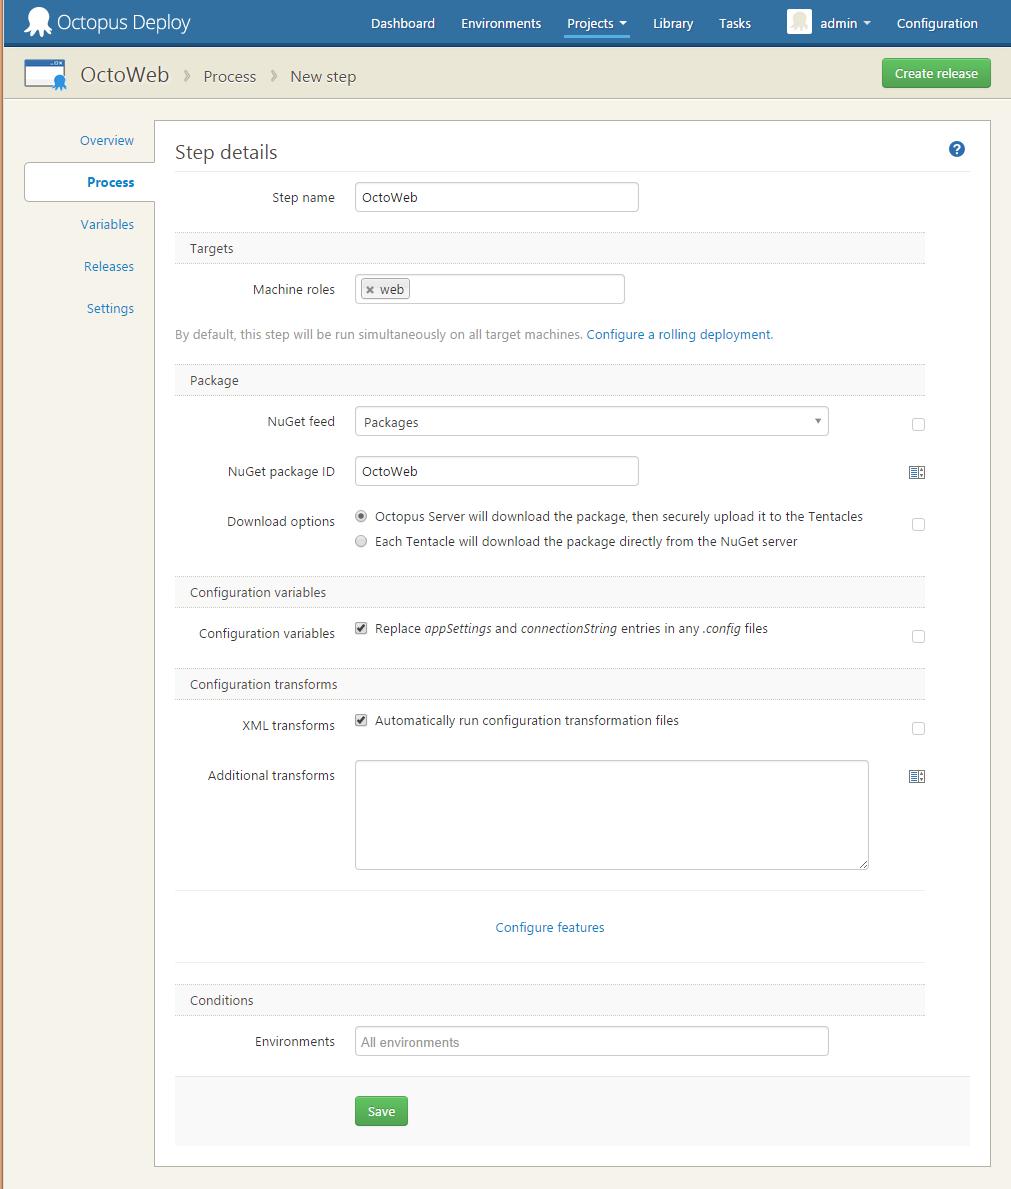 NuGet Package step completed